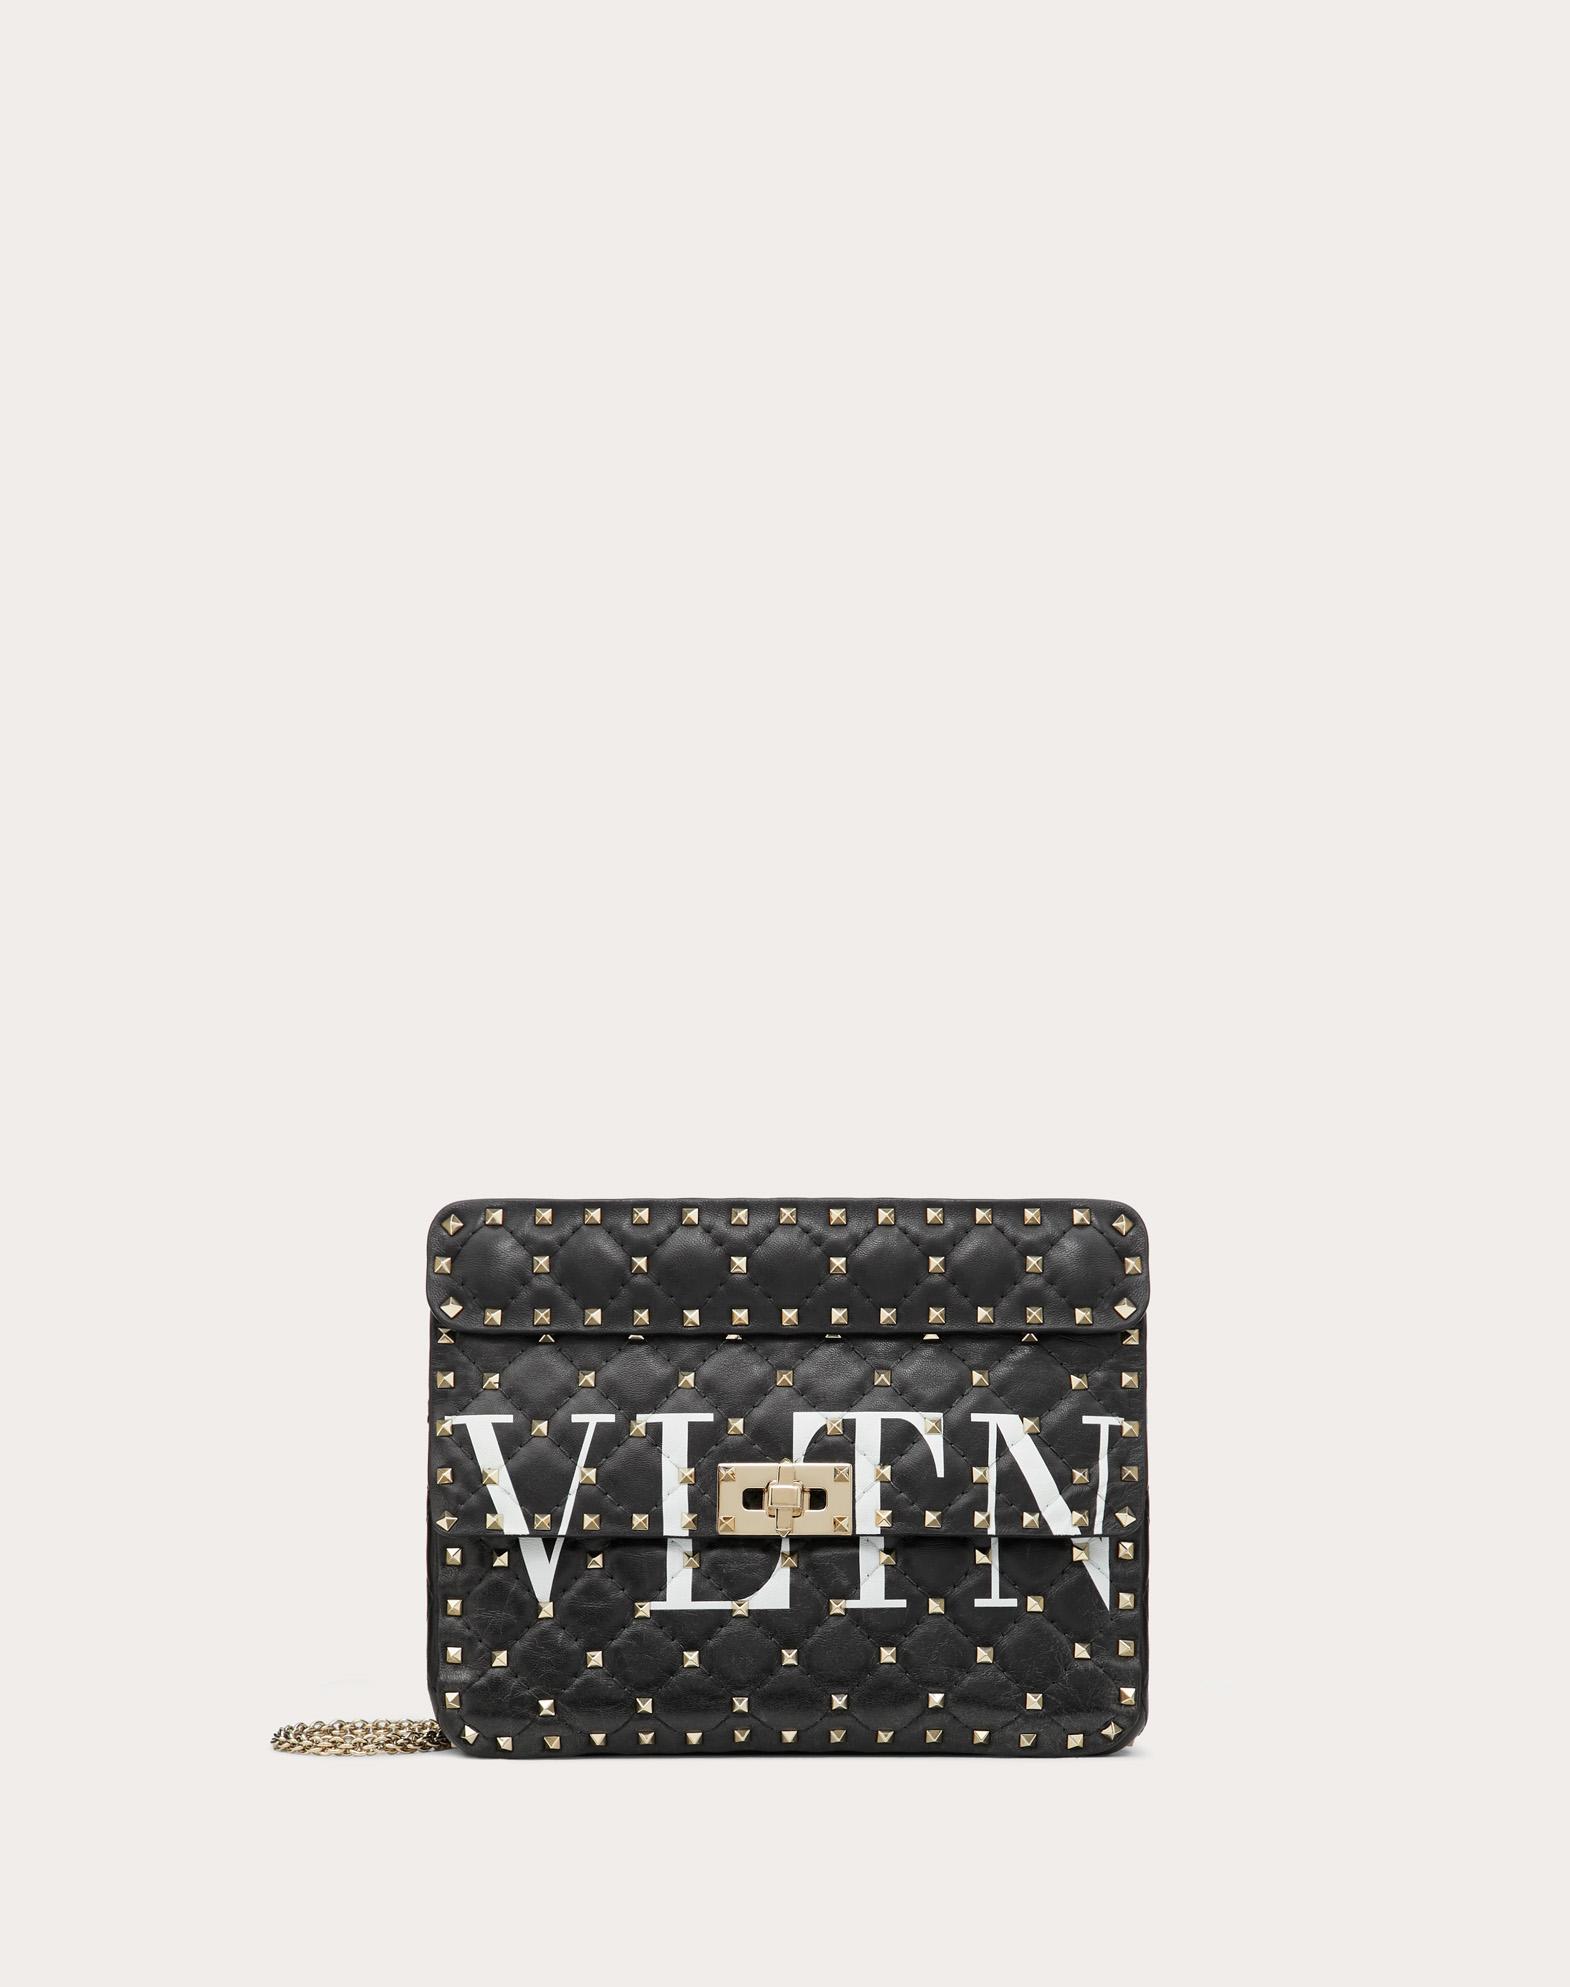 Medium VLTN Rockstud Spike.it Bag